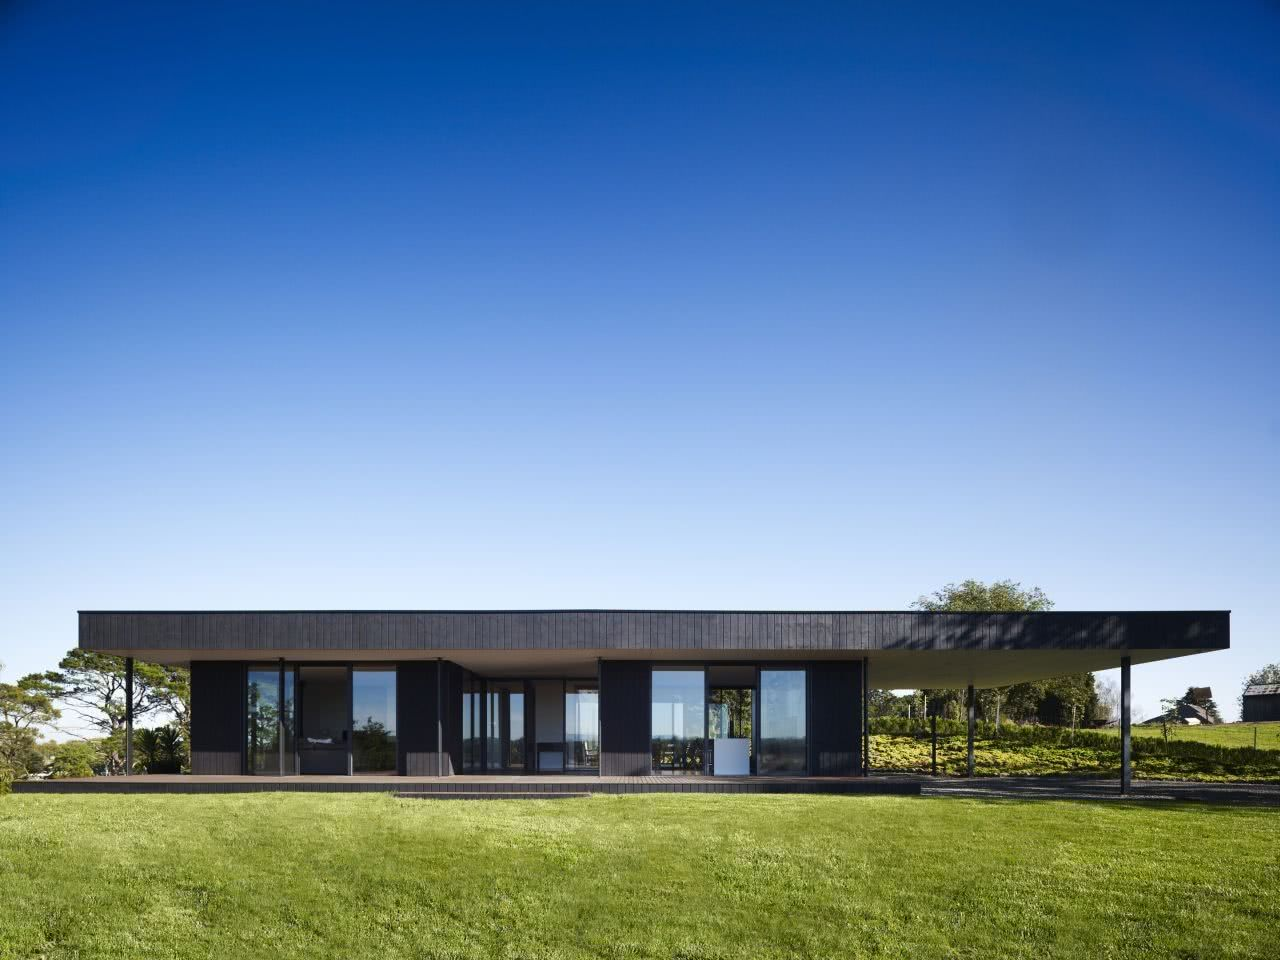 Casa térrea com estilo industrial.